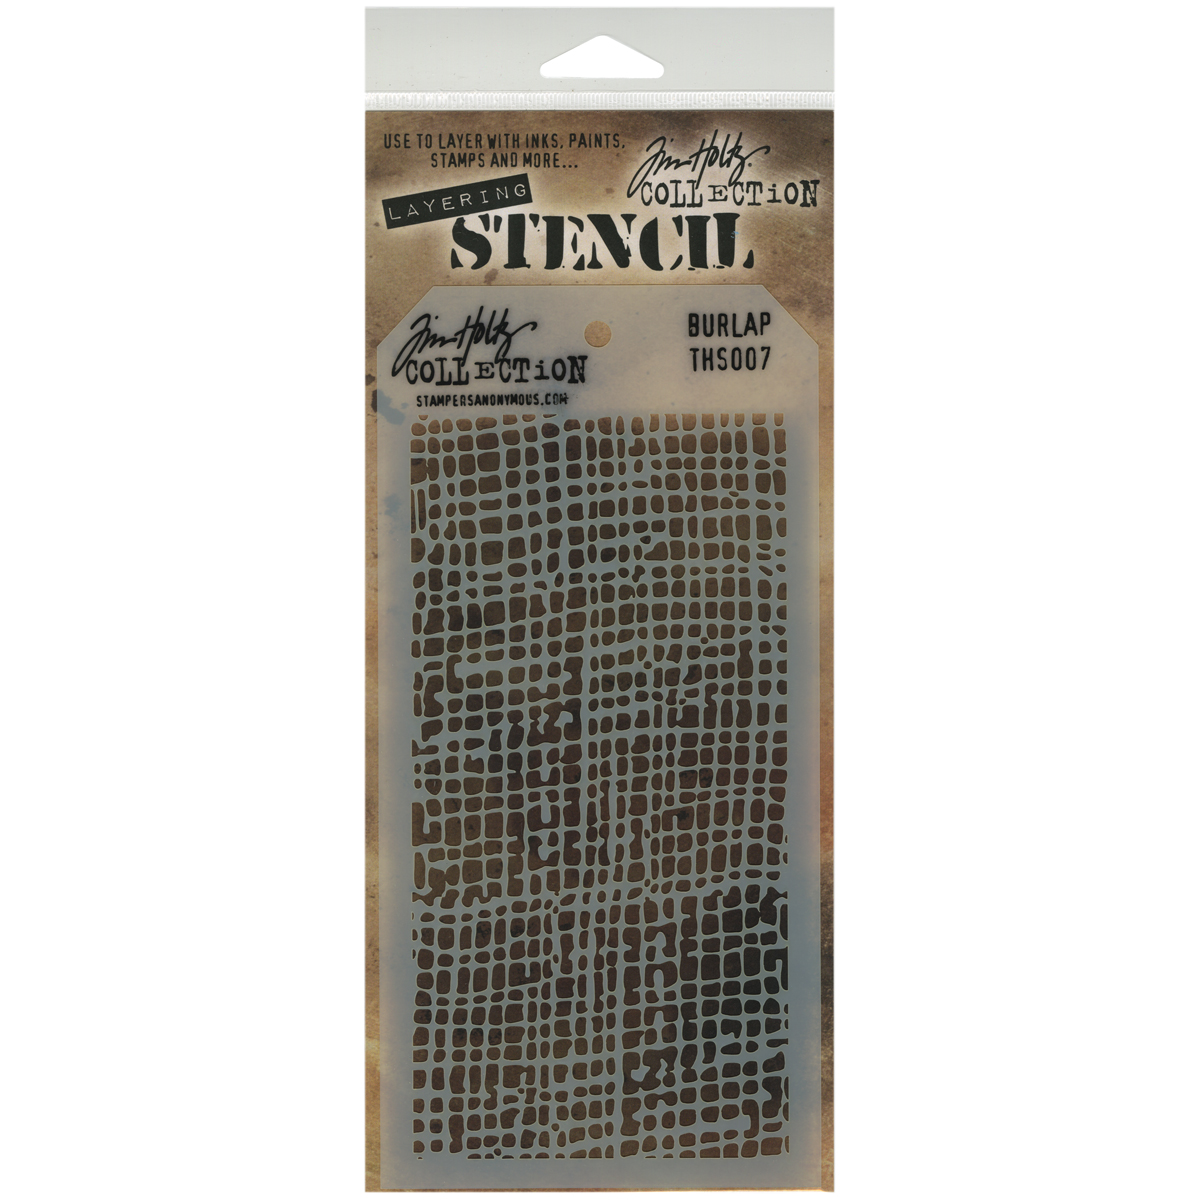 Tim Holtz Layered Stencil 4.125X8.5-Burlap